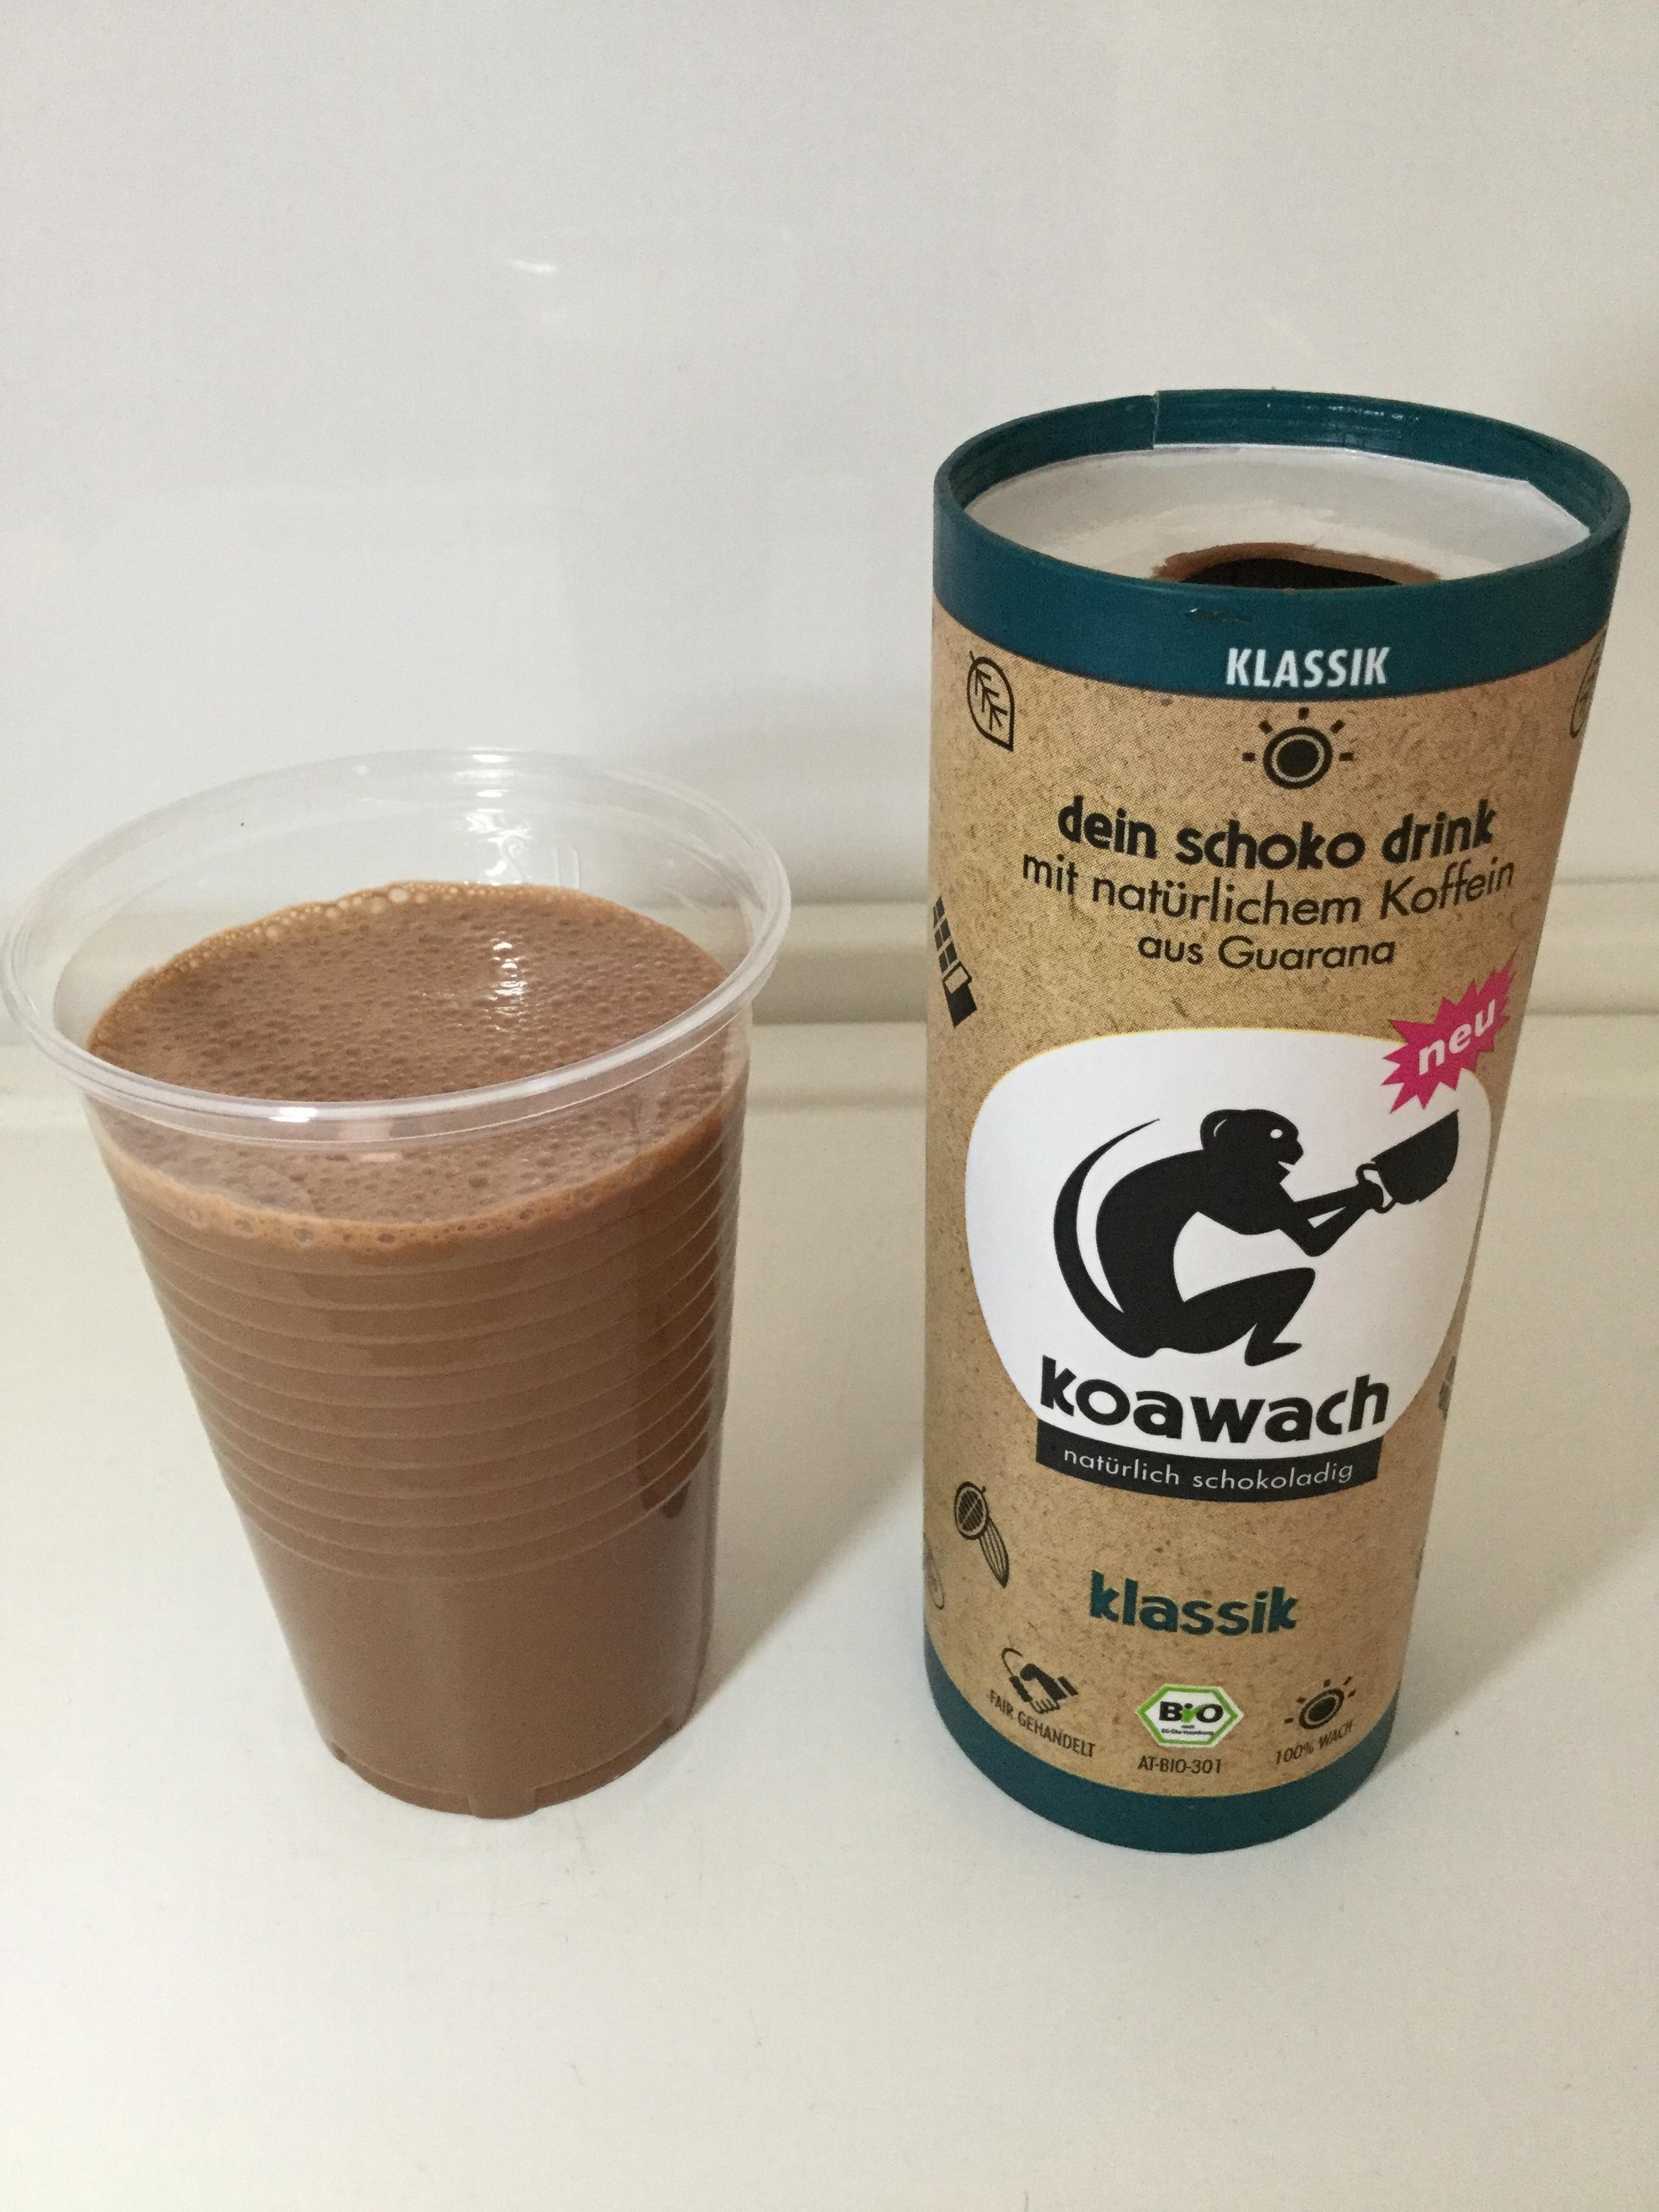 Koawach Klassik Naturlich Schokoladig Cup